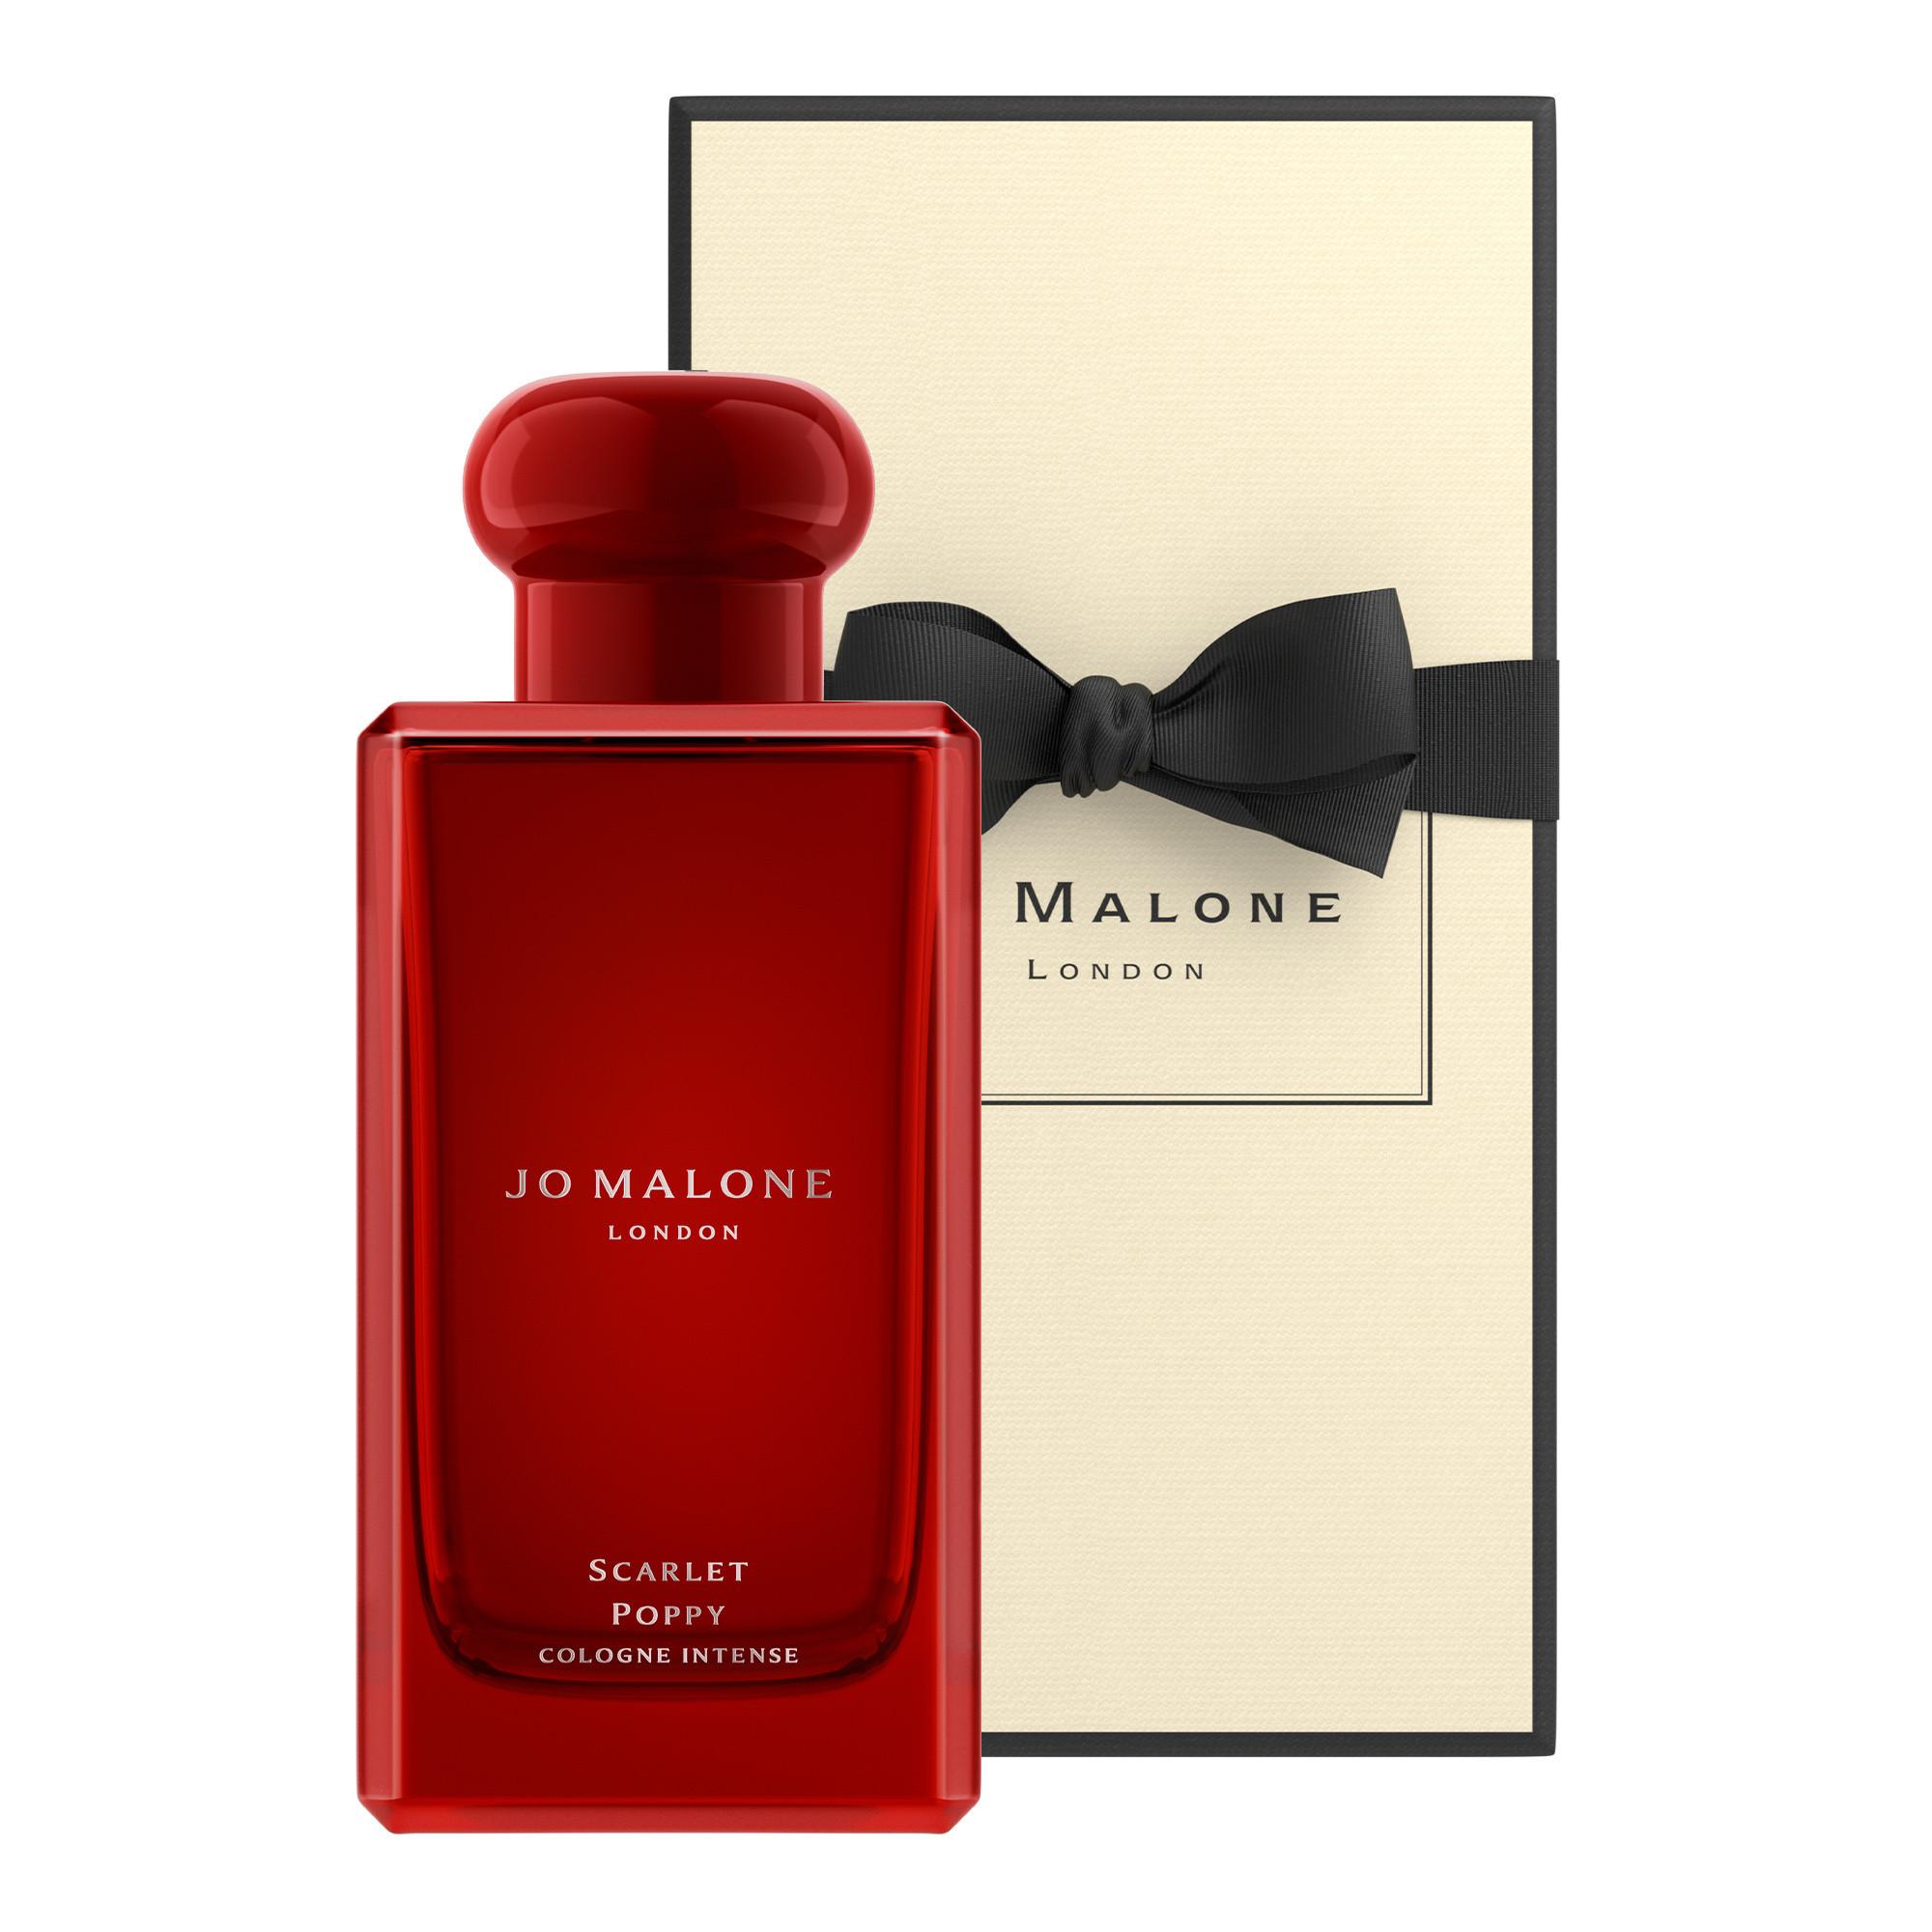 Jo Malone London scarlet poppy cologne intense 100 ml, Beige, large image number 1